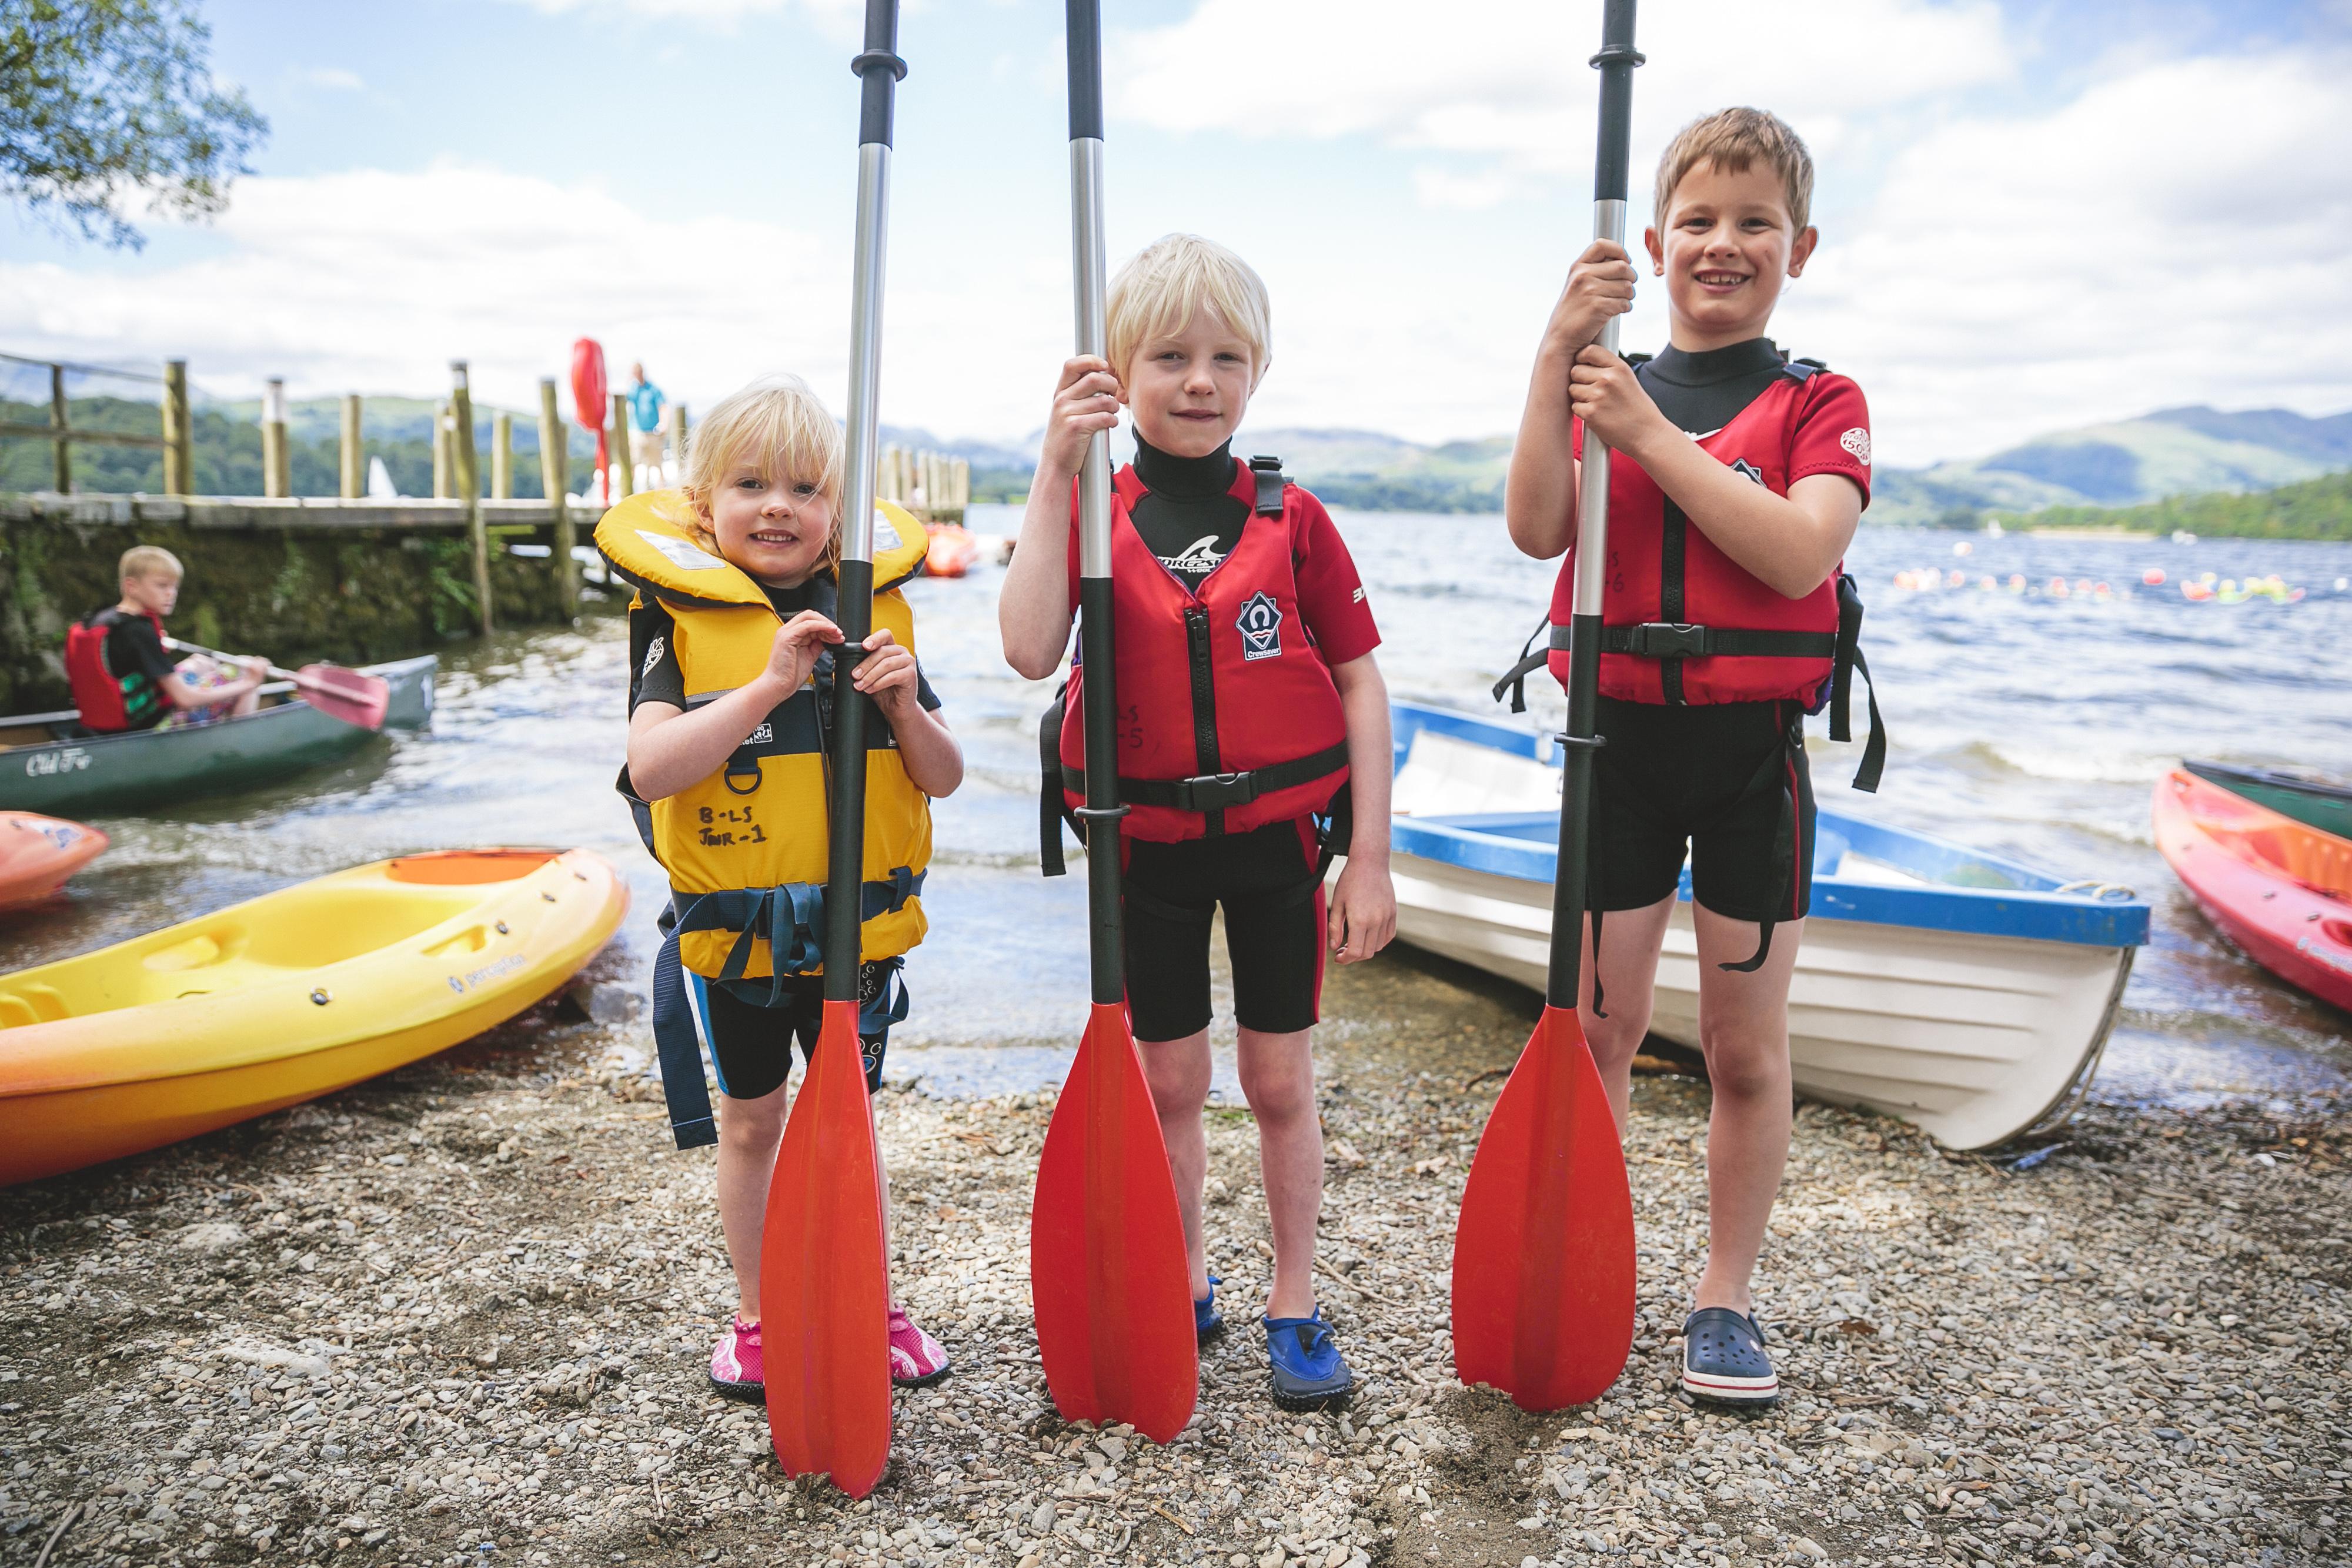 Children get ready to go kayaking at Brockhole on Windermere